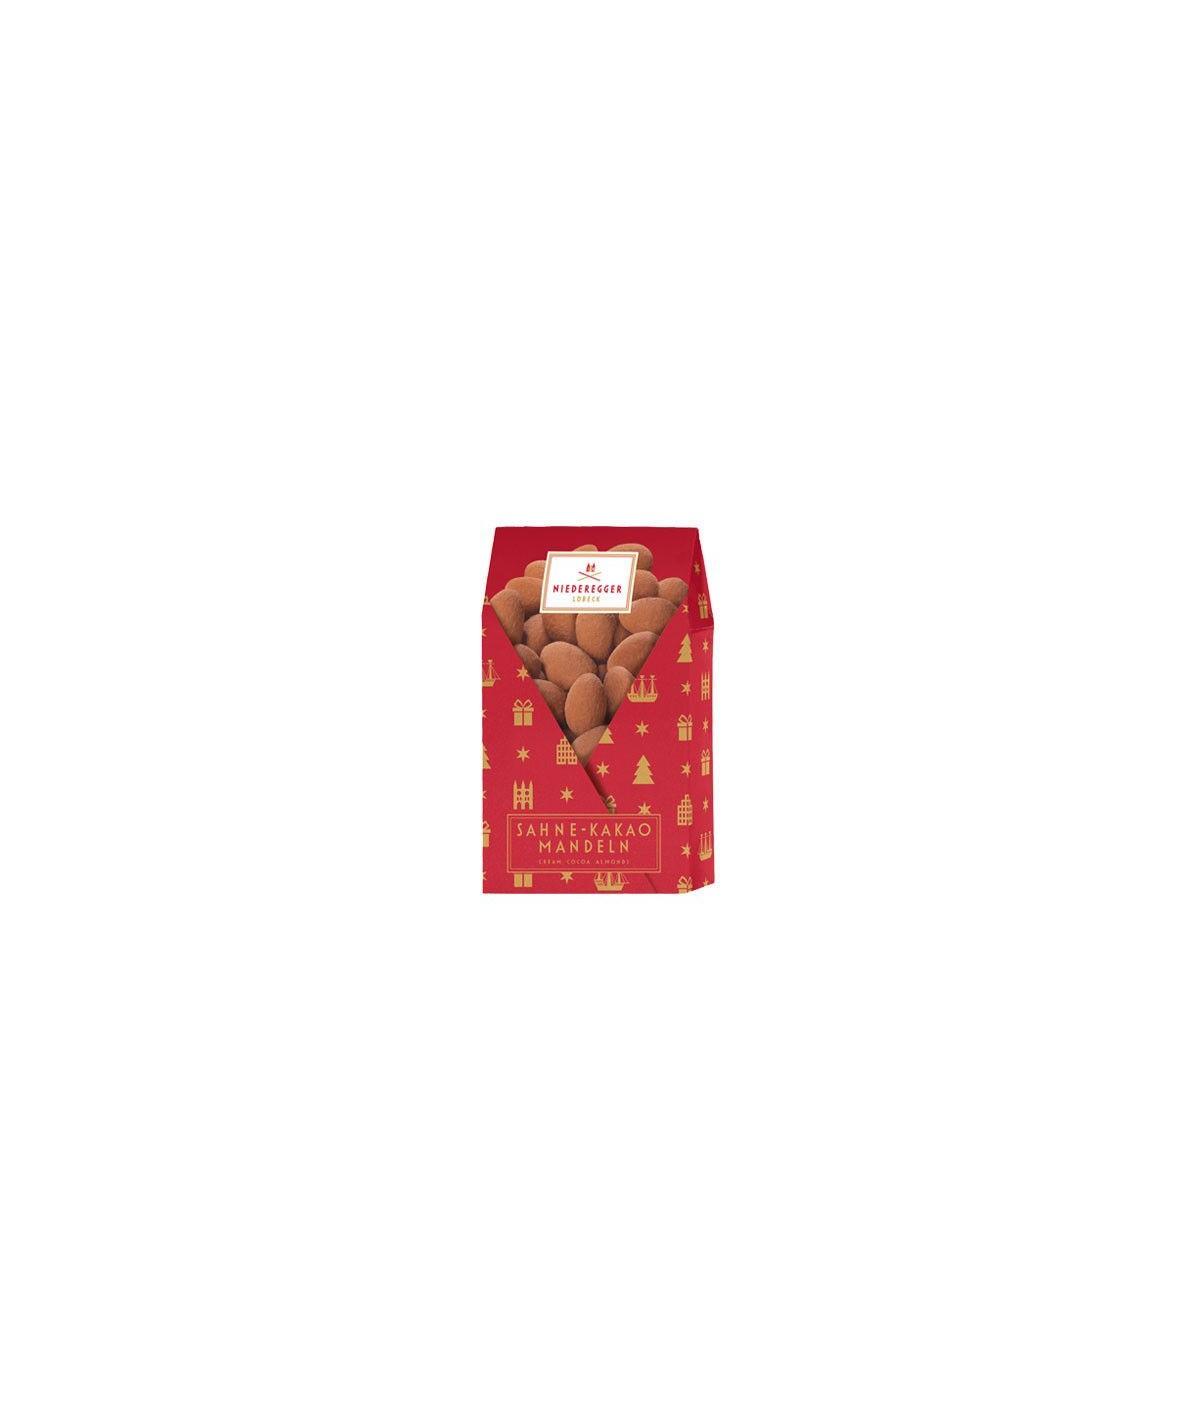 Sahne Kakao Mandeln Niederegger 100g